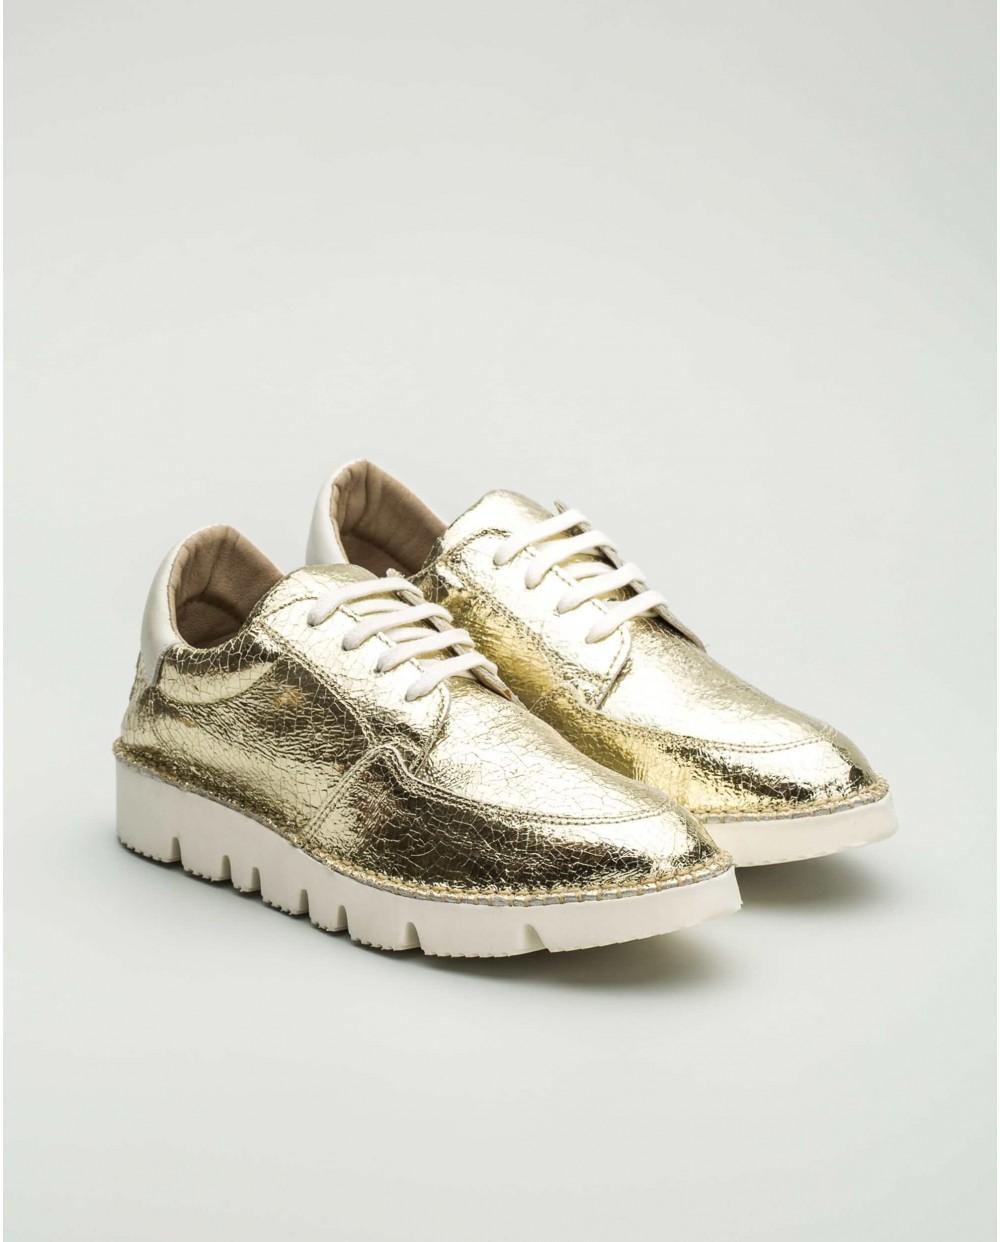 Ultralight metallic sneakers